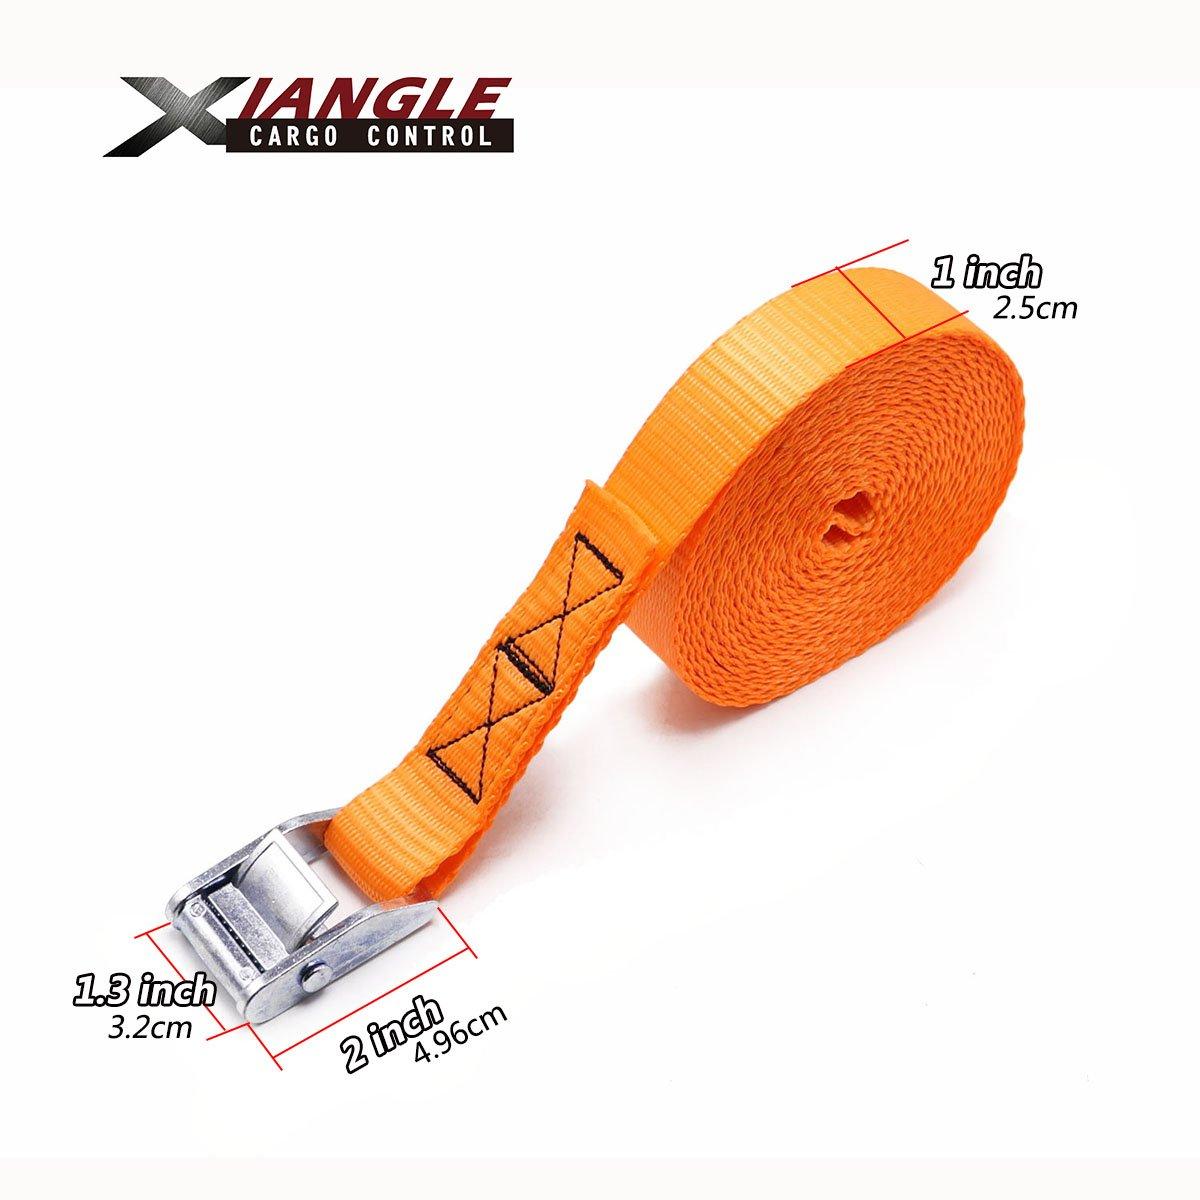 1PC NO-LOGO CMM-Y 7806-2RS Bearing 30X42X7mm for Bicycle Bottom Bracket Repair Parts BB30 7806 2RS Angular Contact Ball Bearings 7806-RS